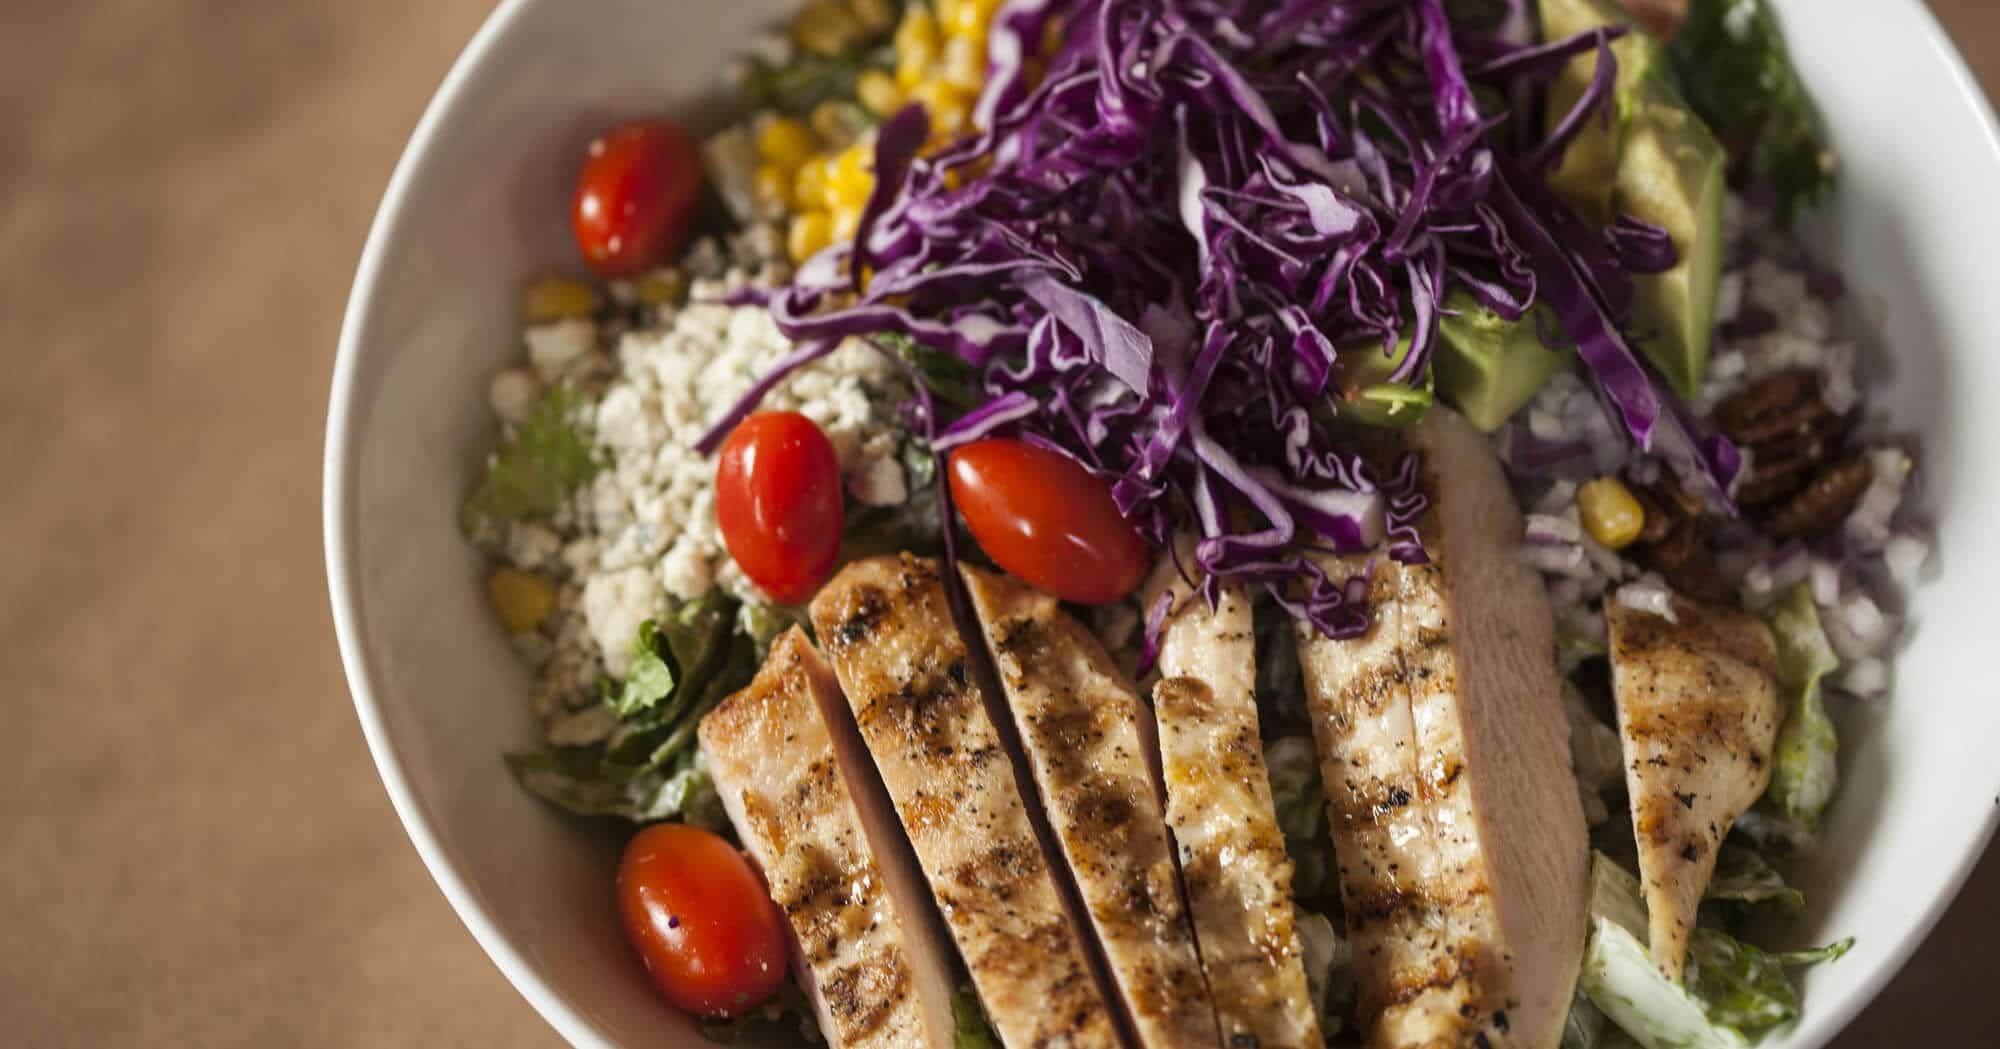 Great tasting Salads at Harvey's